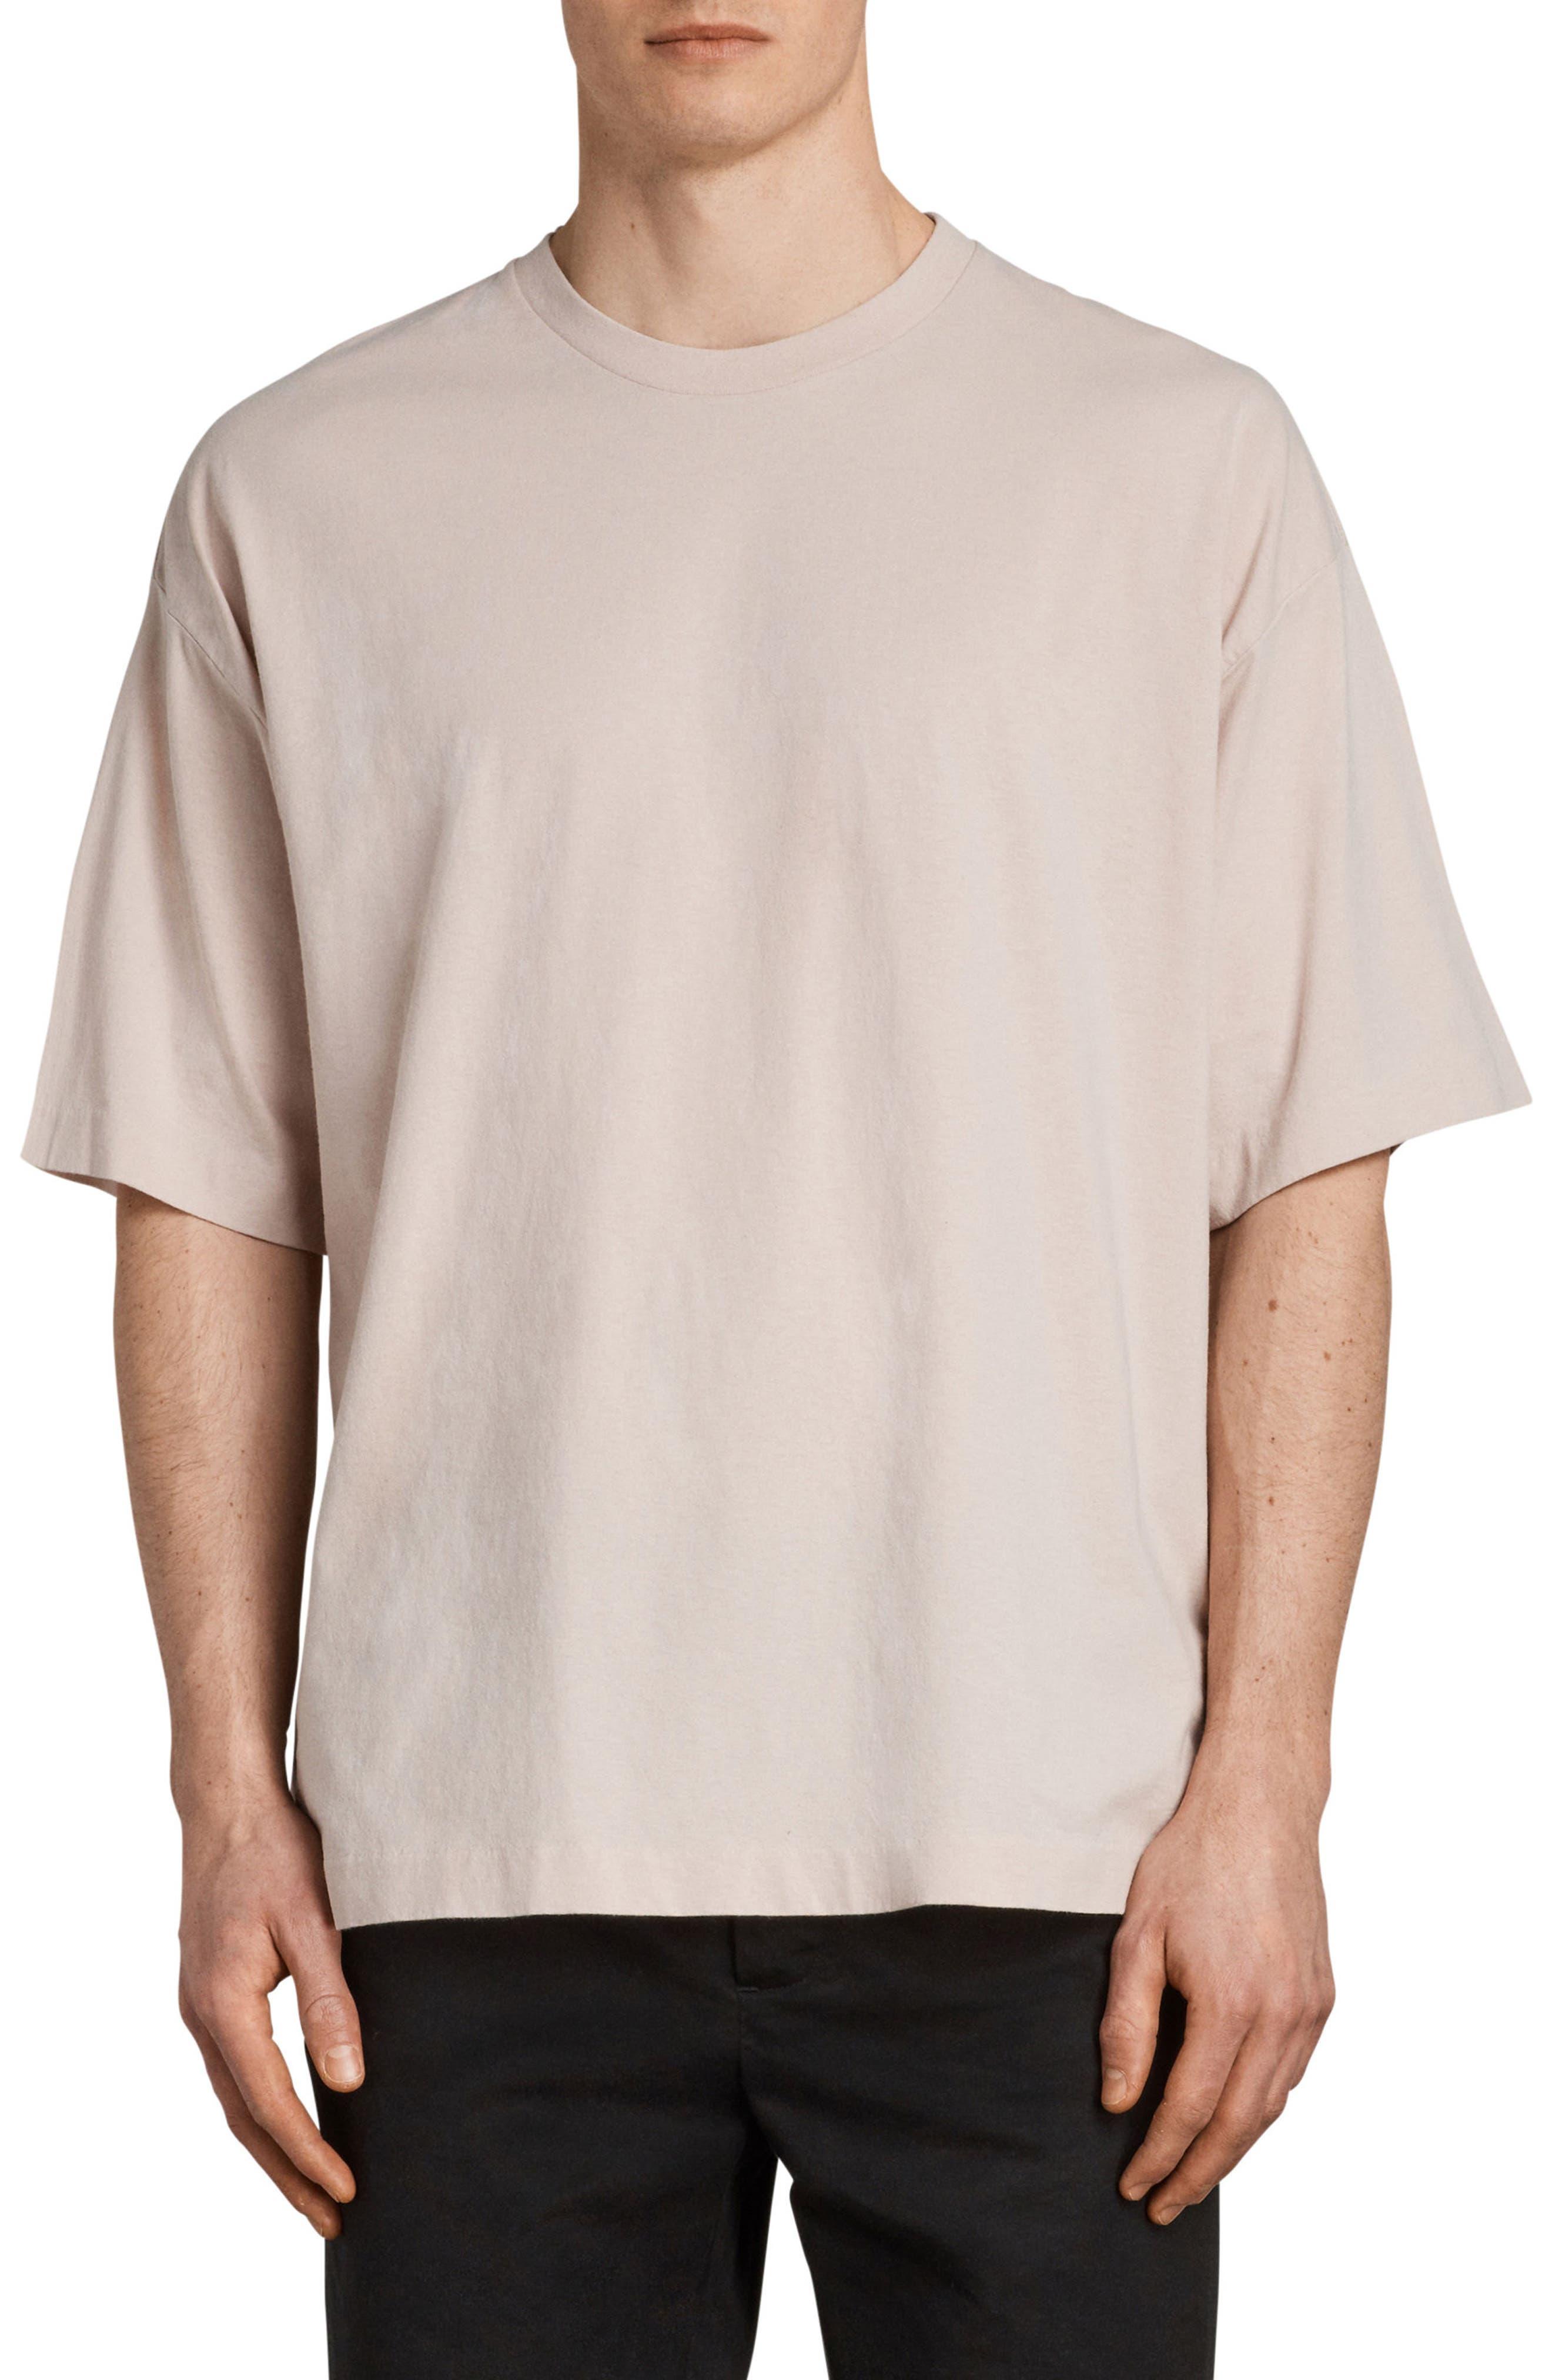 Atnom Crewneck T-Shirt,                         Main,                         color, River Pink